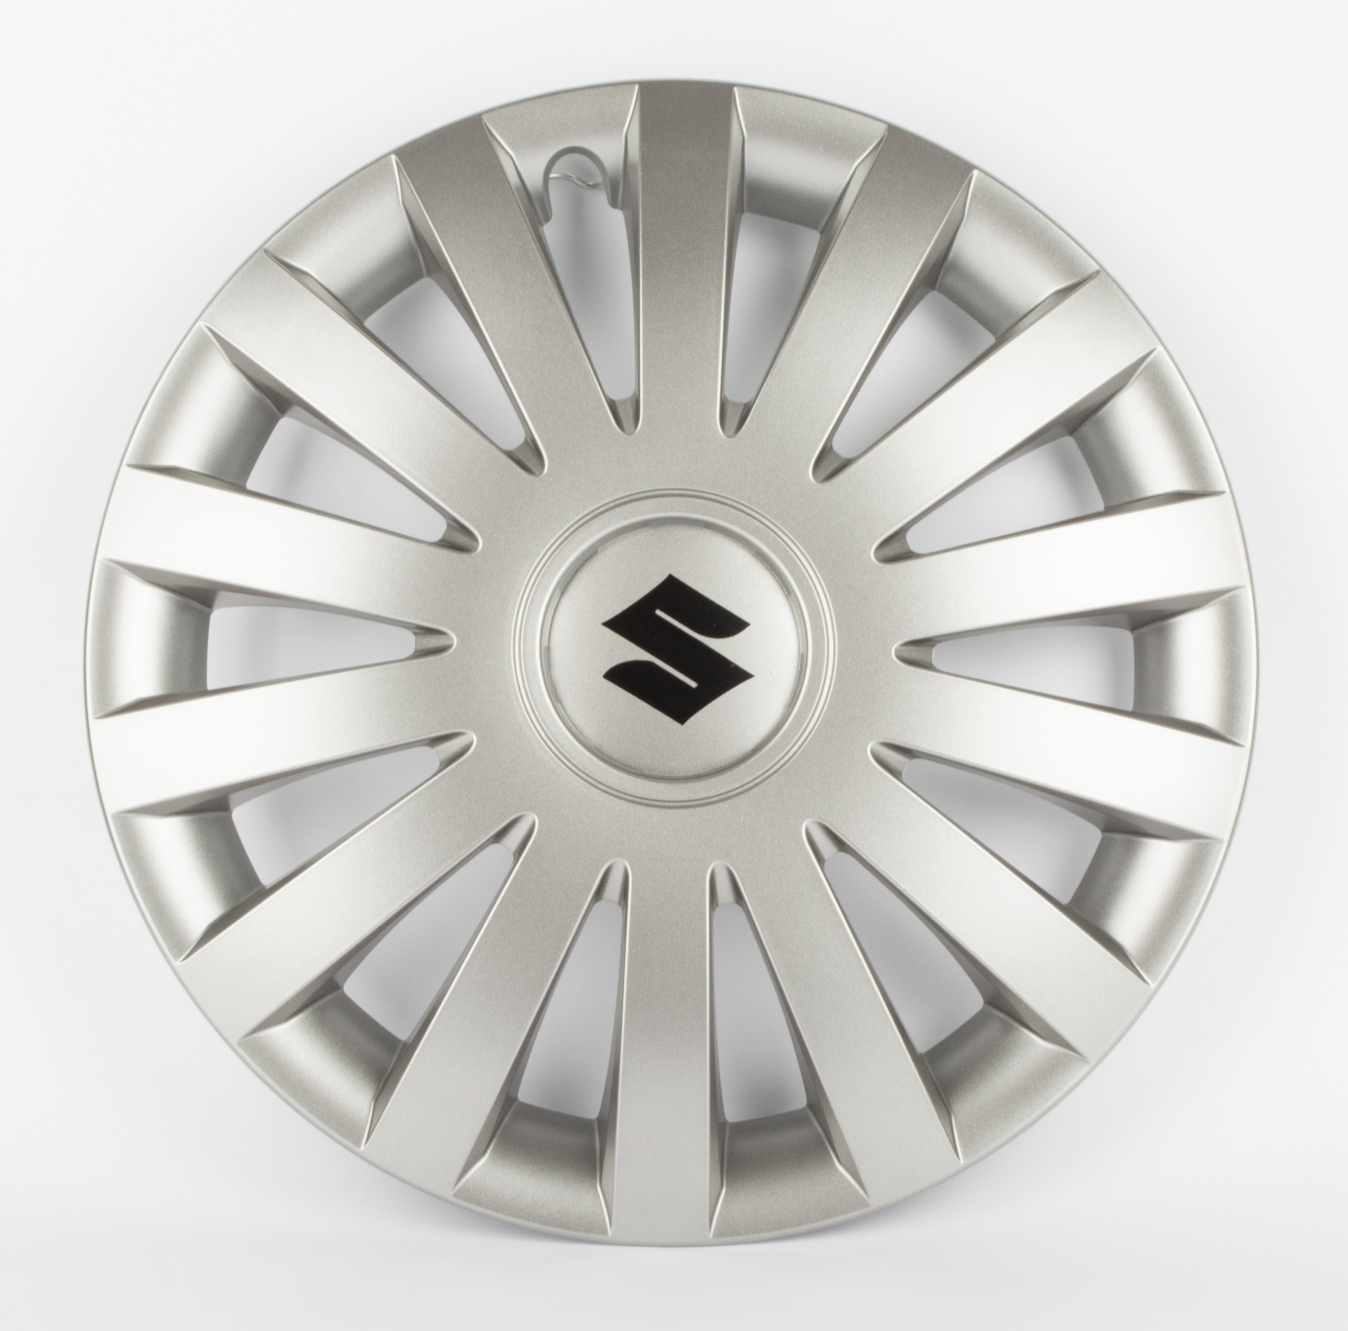 "Suzuki Genuine Set Of 4 14/"" Wheel Trim Cover Hub Caps in Anthracite 990E0-86G36"